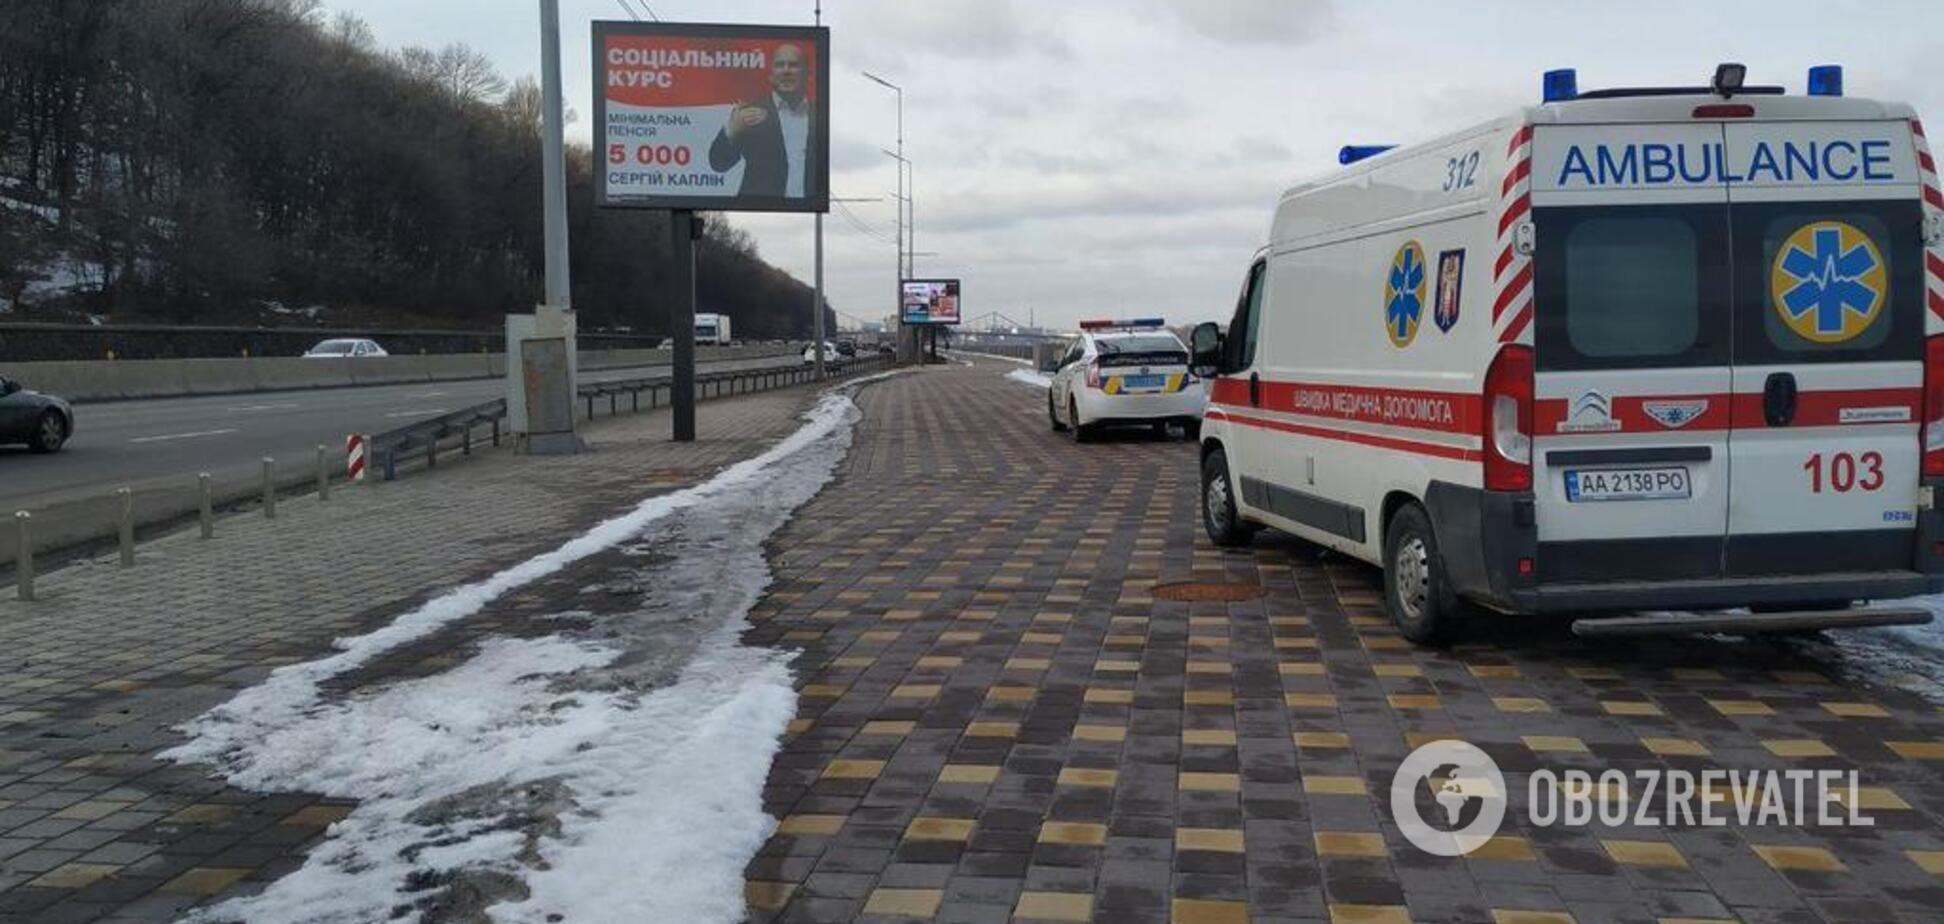 Кримінал Київ